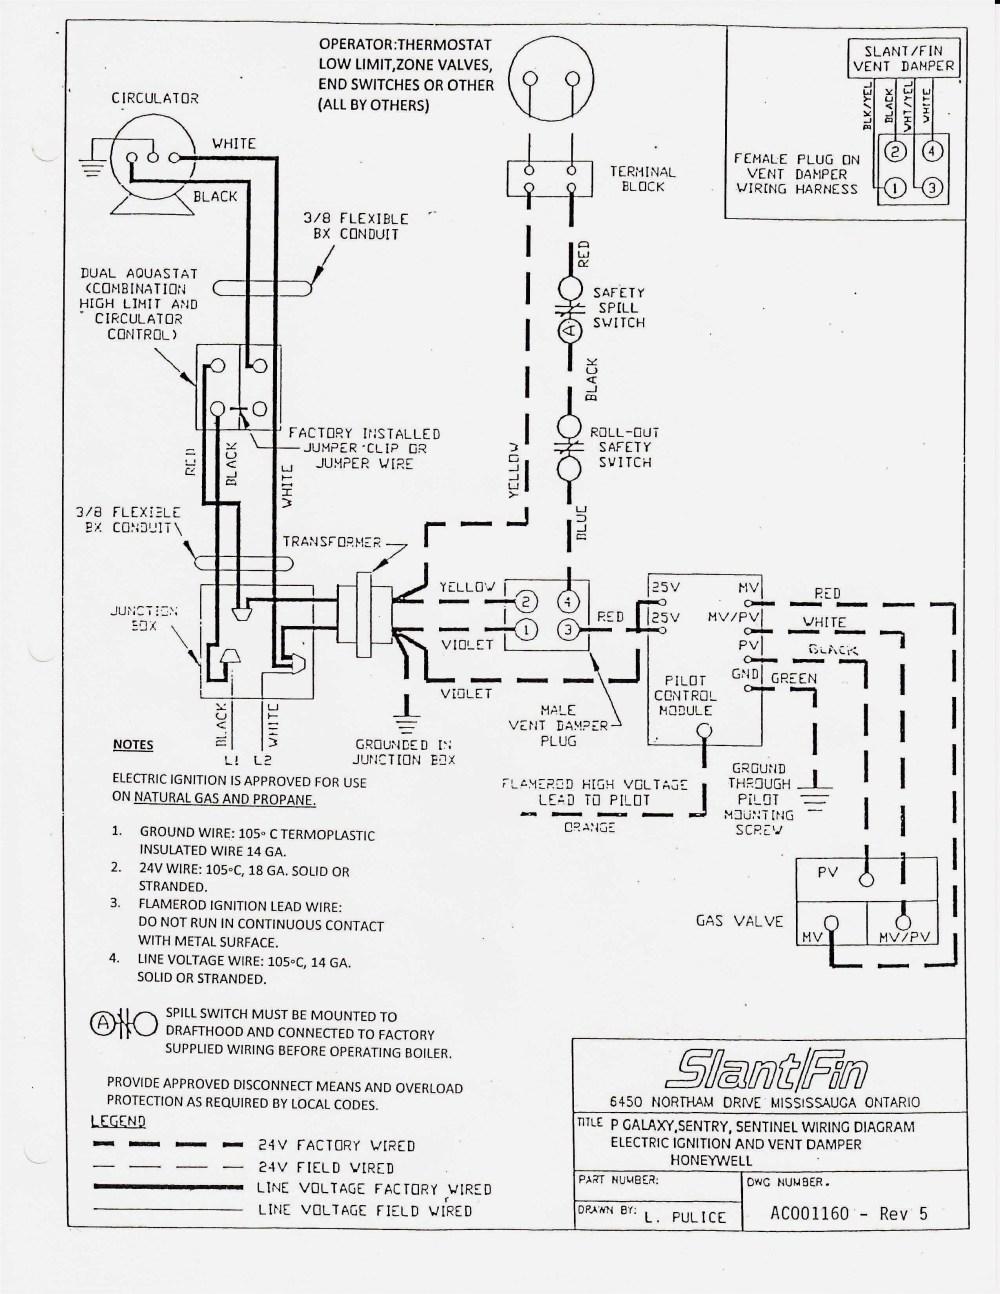 medium resolution of honeywell fan limit switch wiring diagram honeywell fan limit switch wiring diagram unique honeywell fan furnace